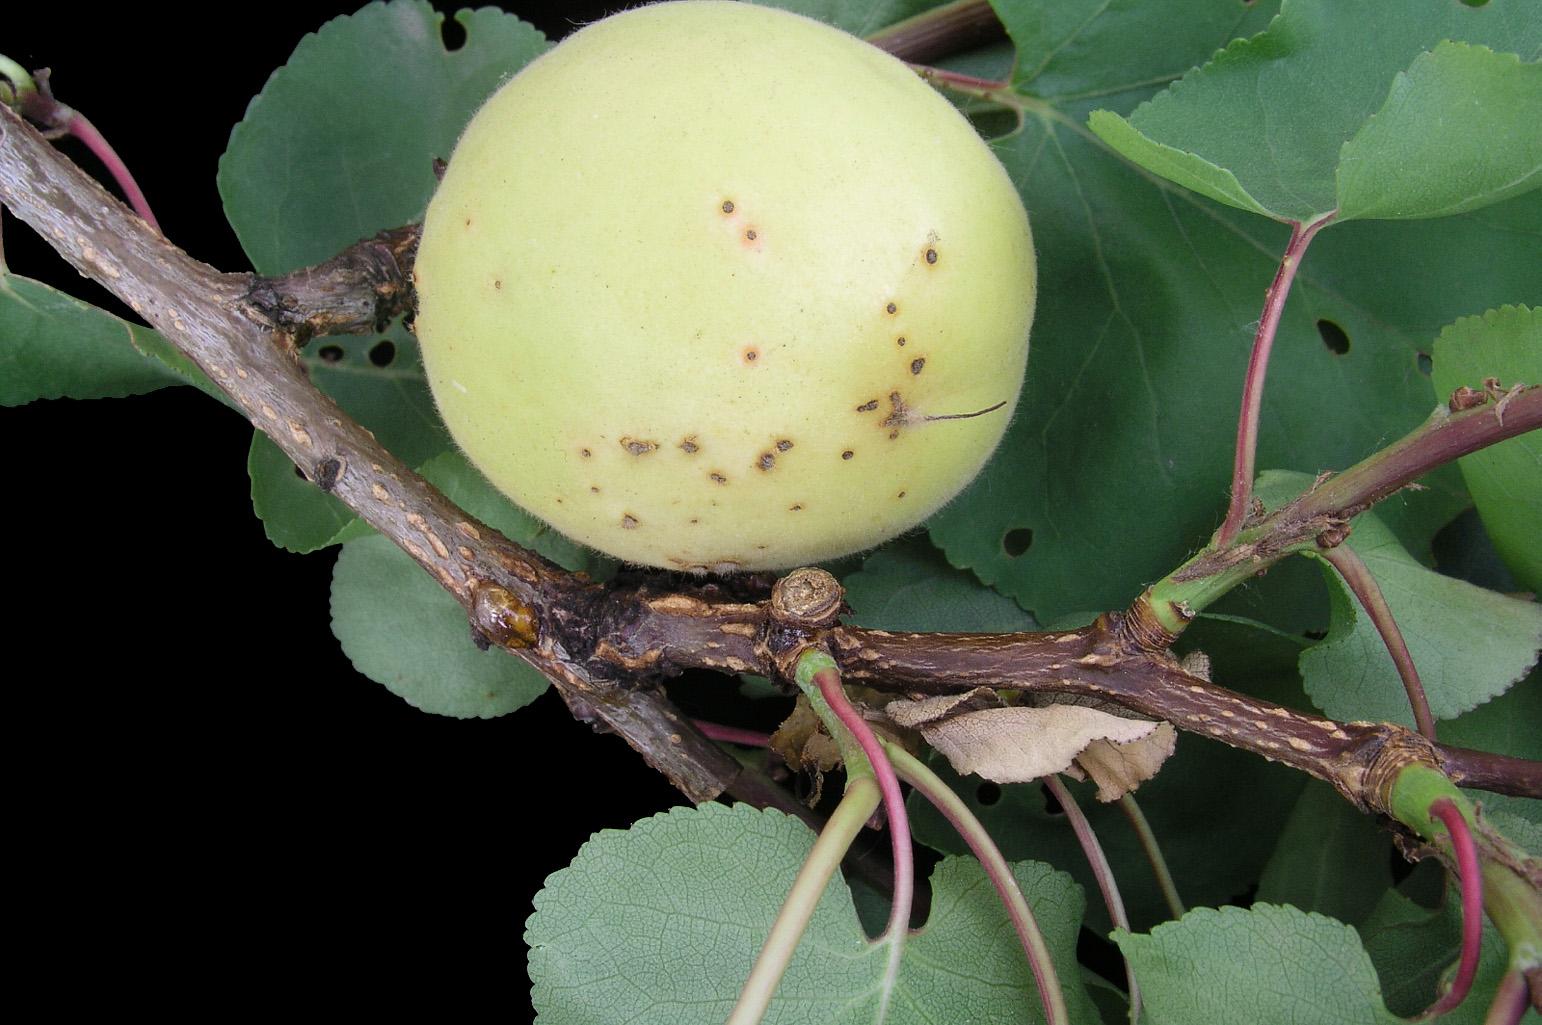 Fruto con manchitas (síntoma del ataque por <span class=cursiva>Stigmina carpophila</span> = <span class=cursiva>Clasterosporium carpophilum</span>)